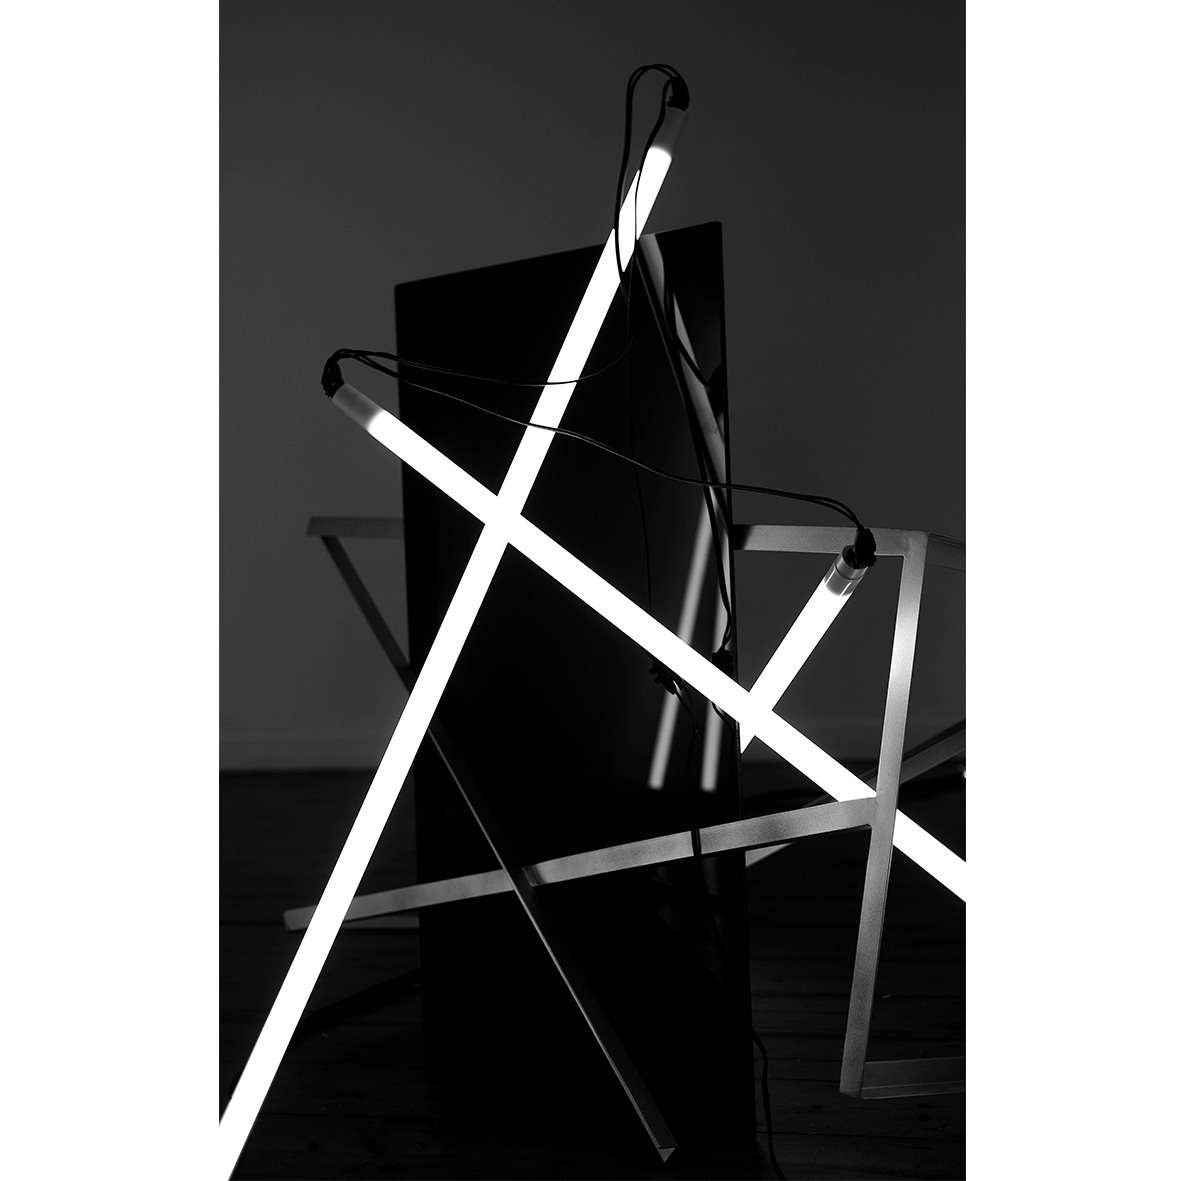 Victoria Scott Falsified Death 1of5 2018 mixed media installation approx. 100 x 50 x 70 cm